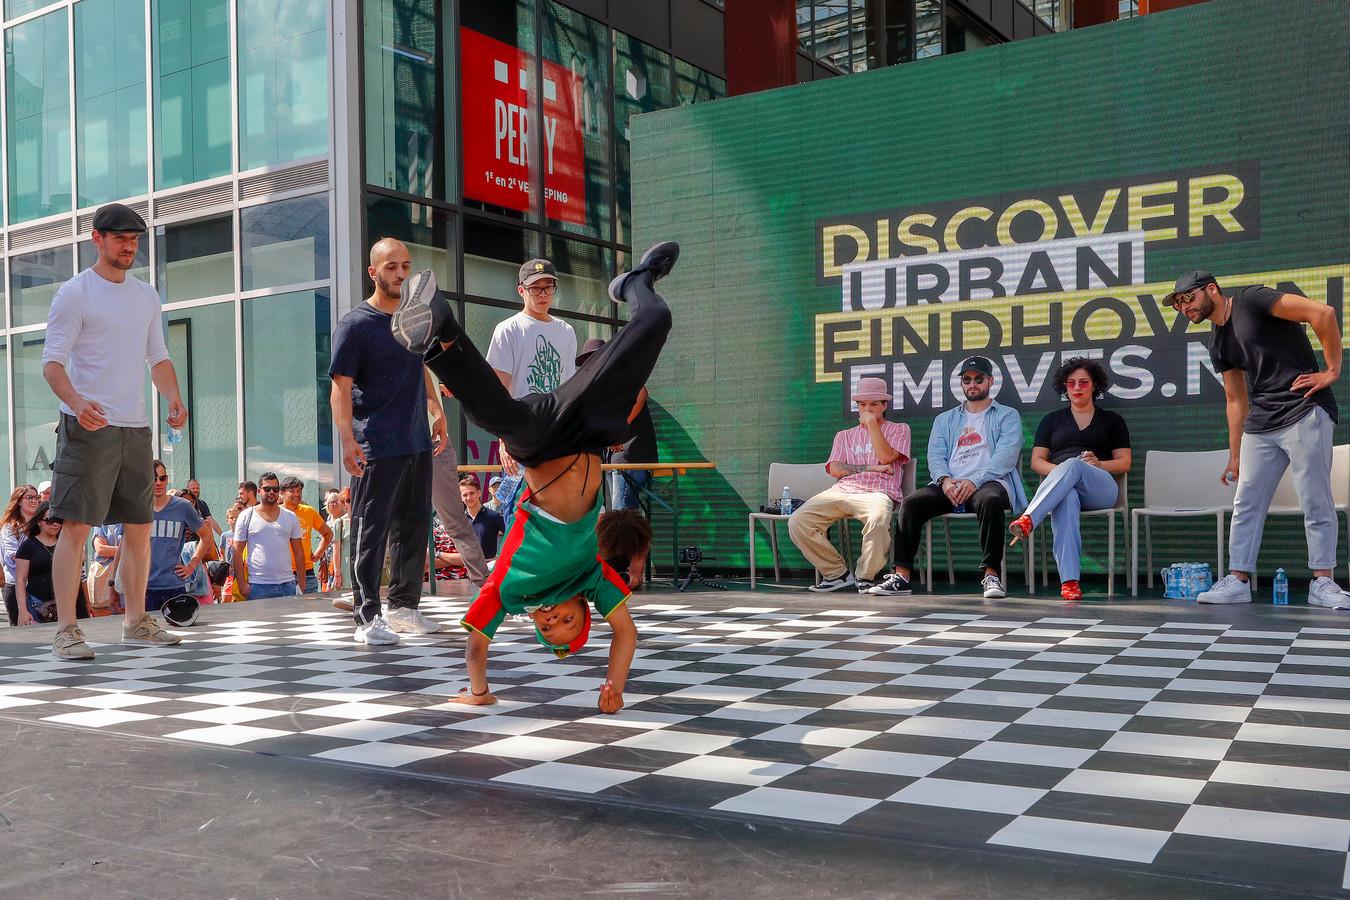 E-Moves festival dansen tijdens de Battle tussen Eindhoven (R) en Brussel (de danser)